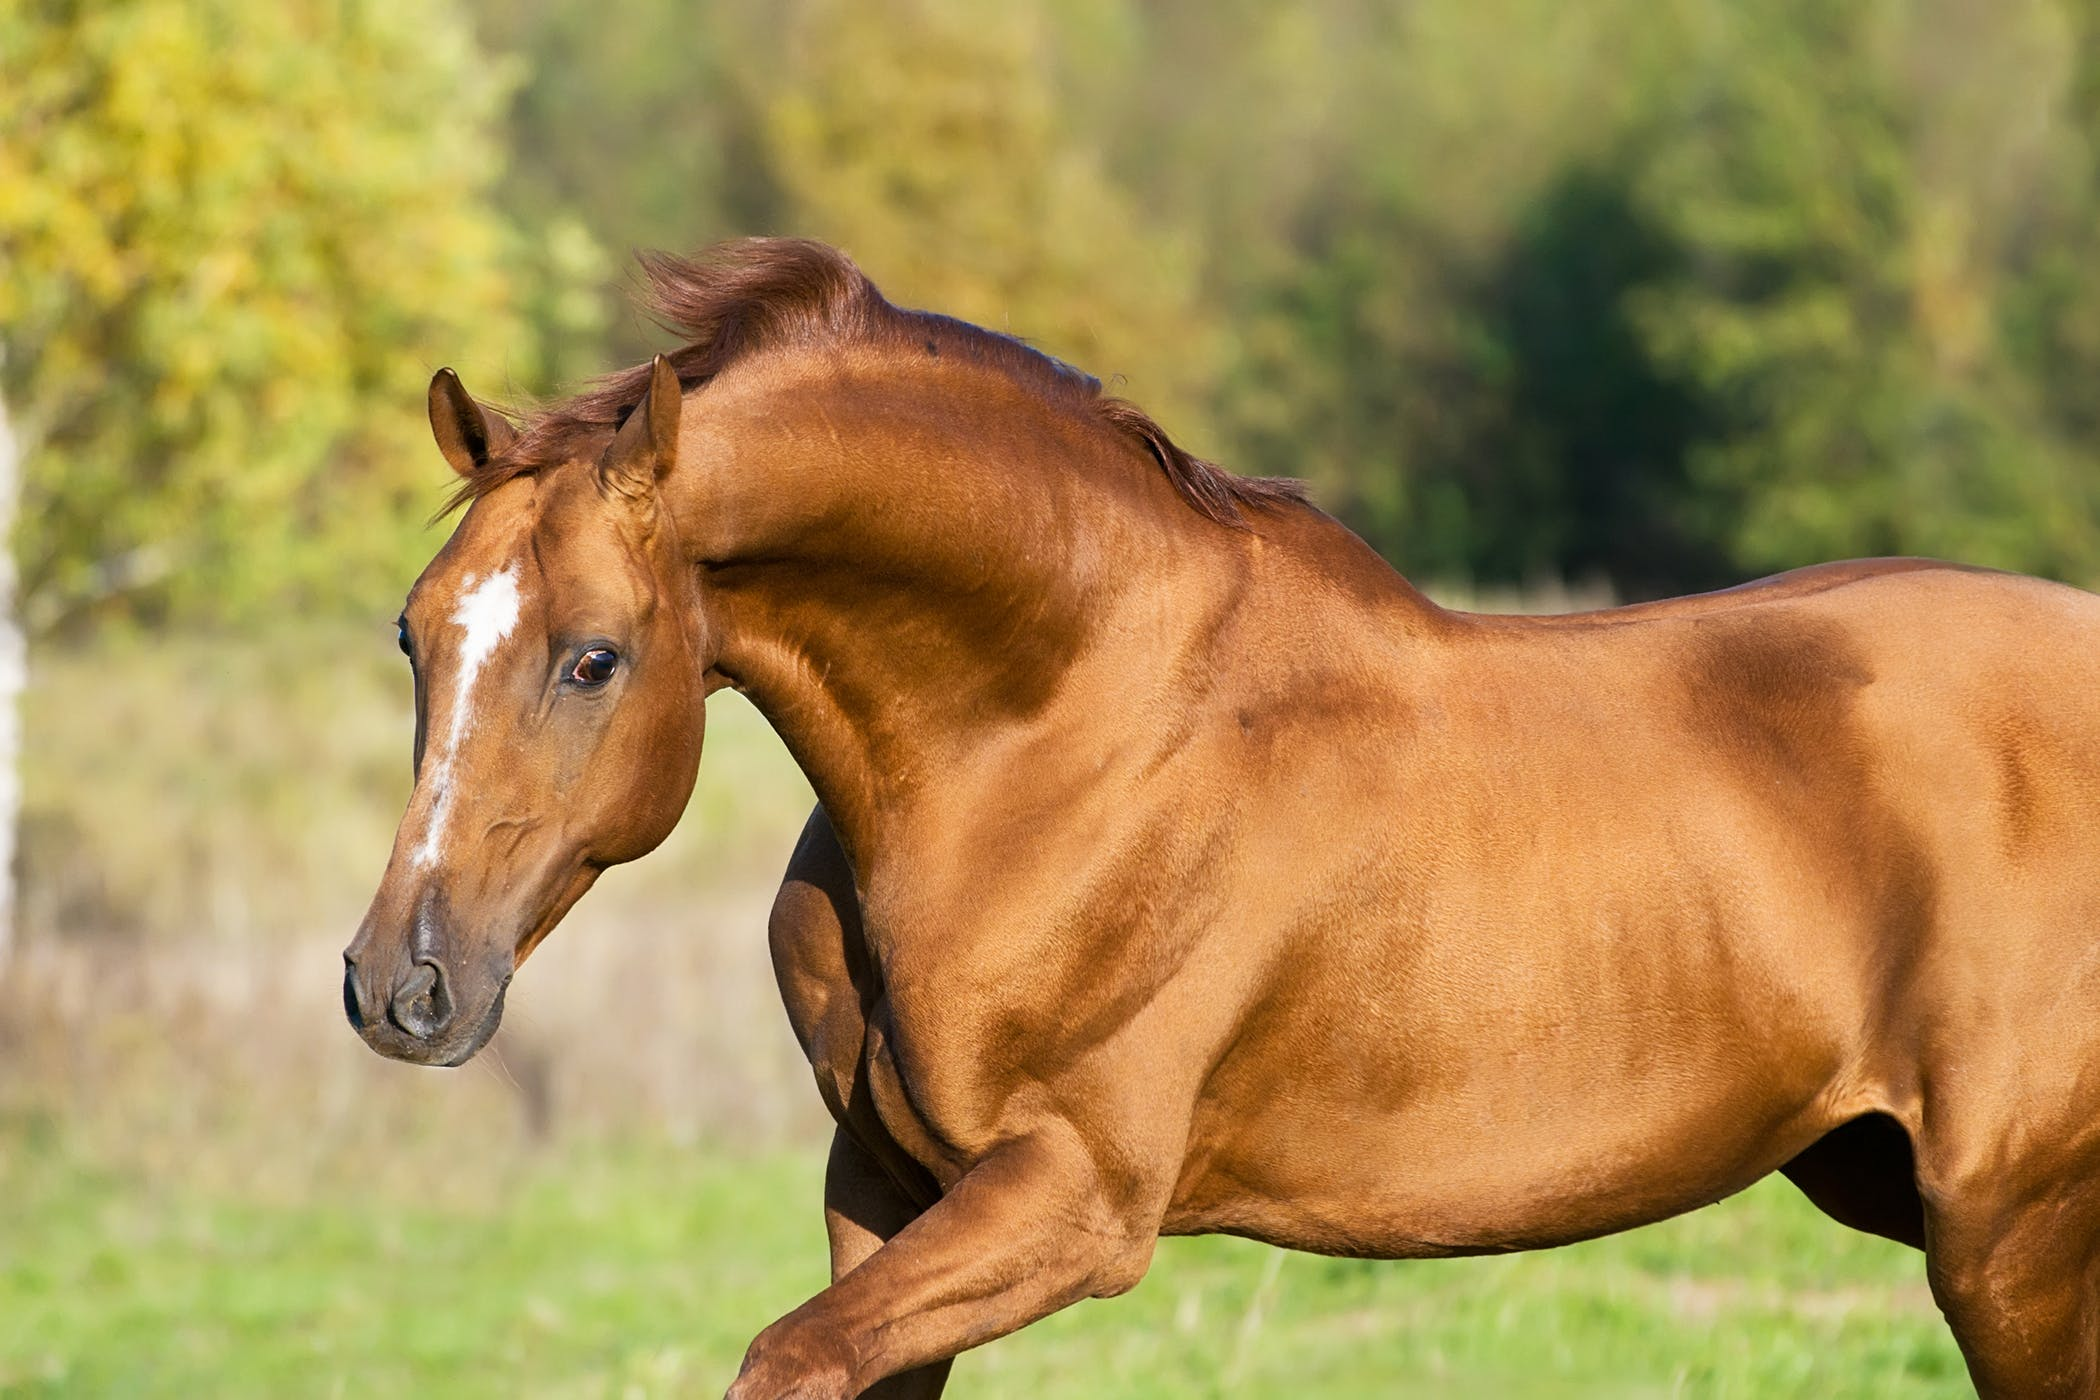 Suprascapular Neuropathy (Sweeney Shoulder) in Horses - Symptoms